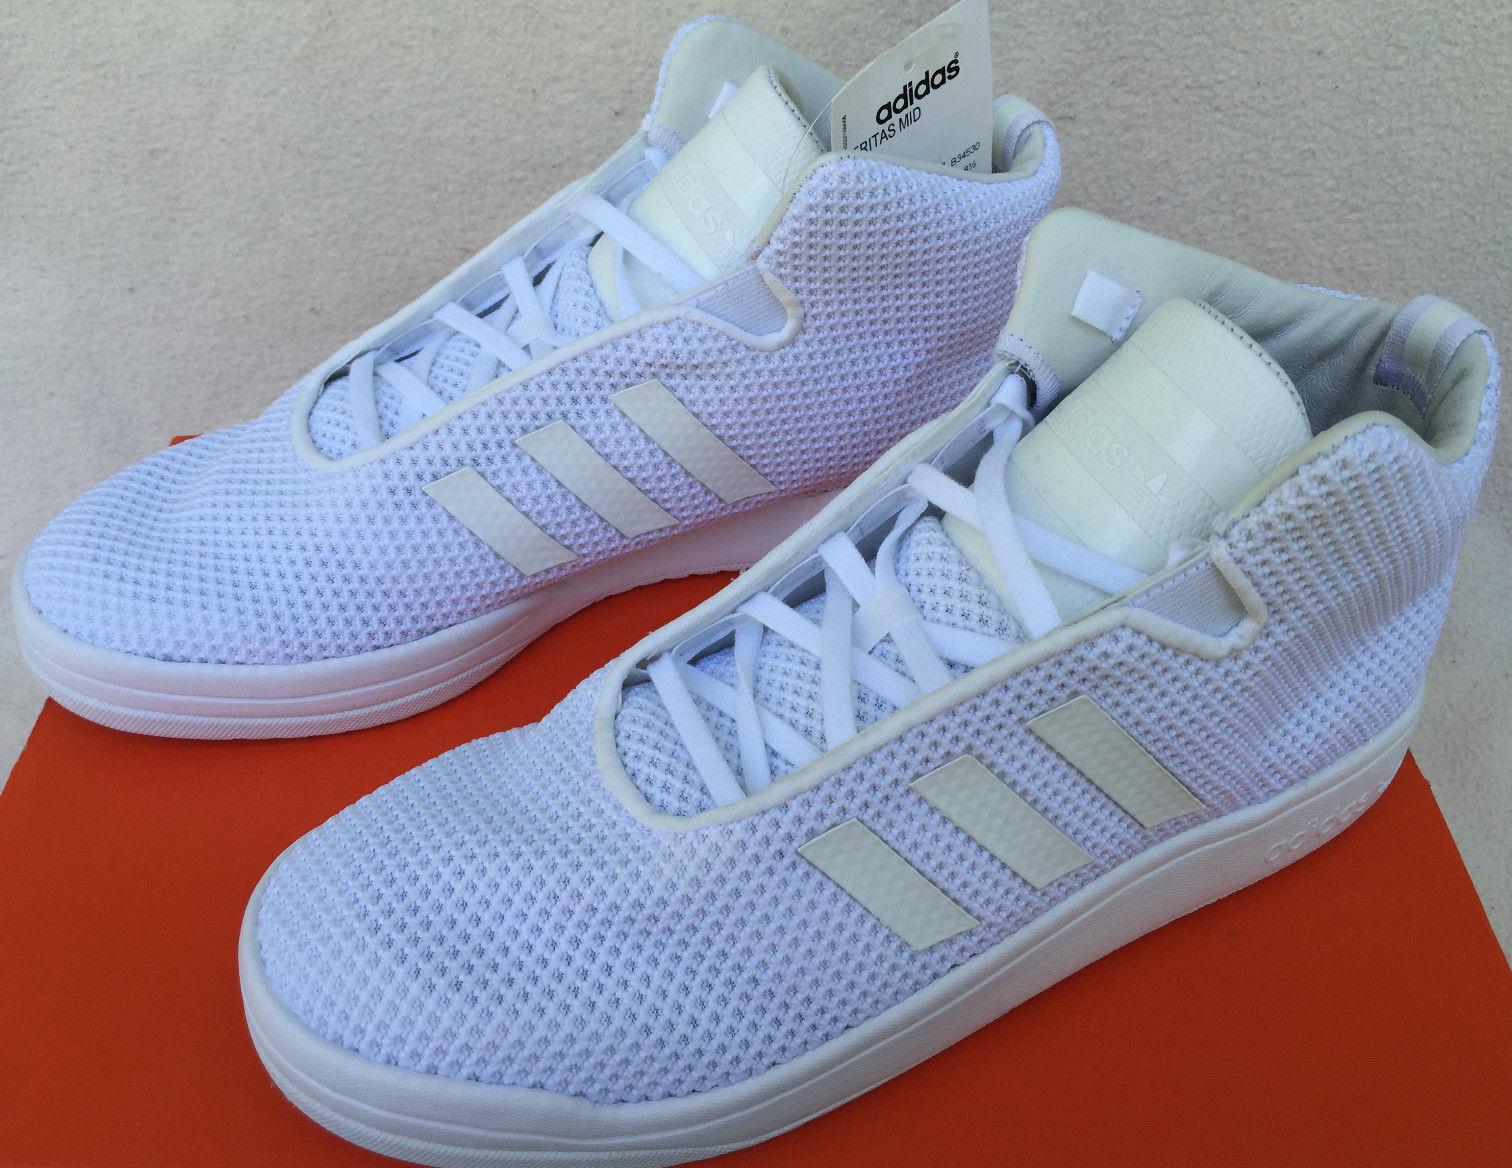 Adidas Veritas Mid B34530 Triple White Casual Basketball Sneaker Shoes Men's 9.5